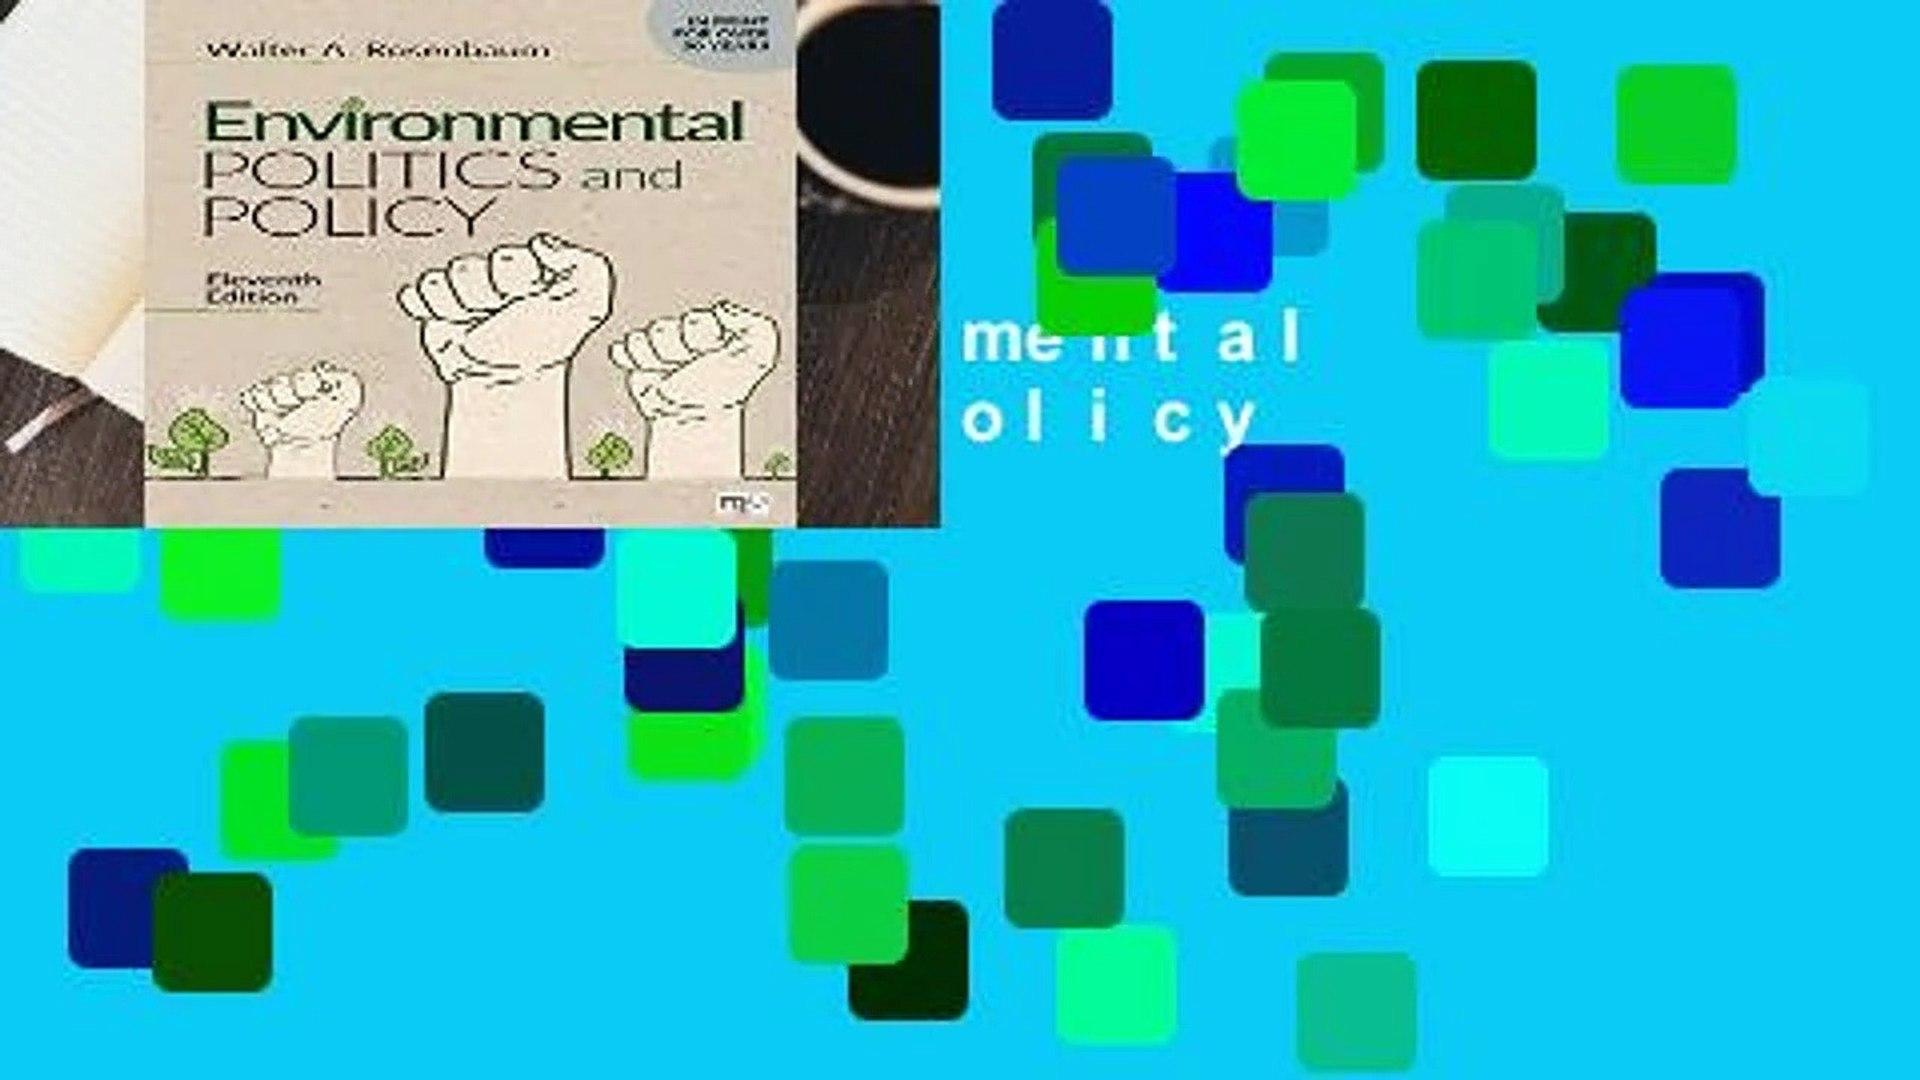 [FREE] Environmental Politics and Policy